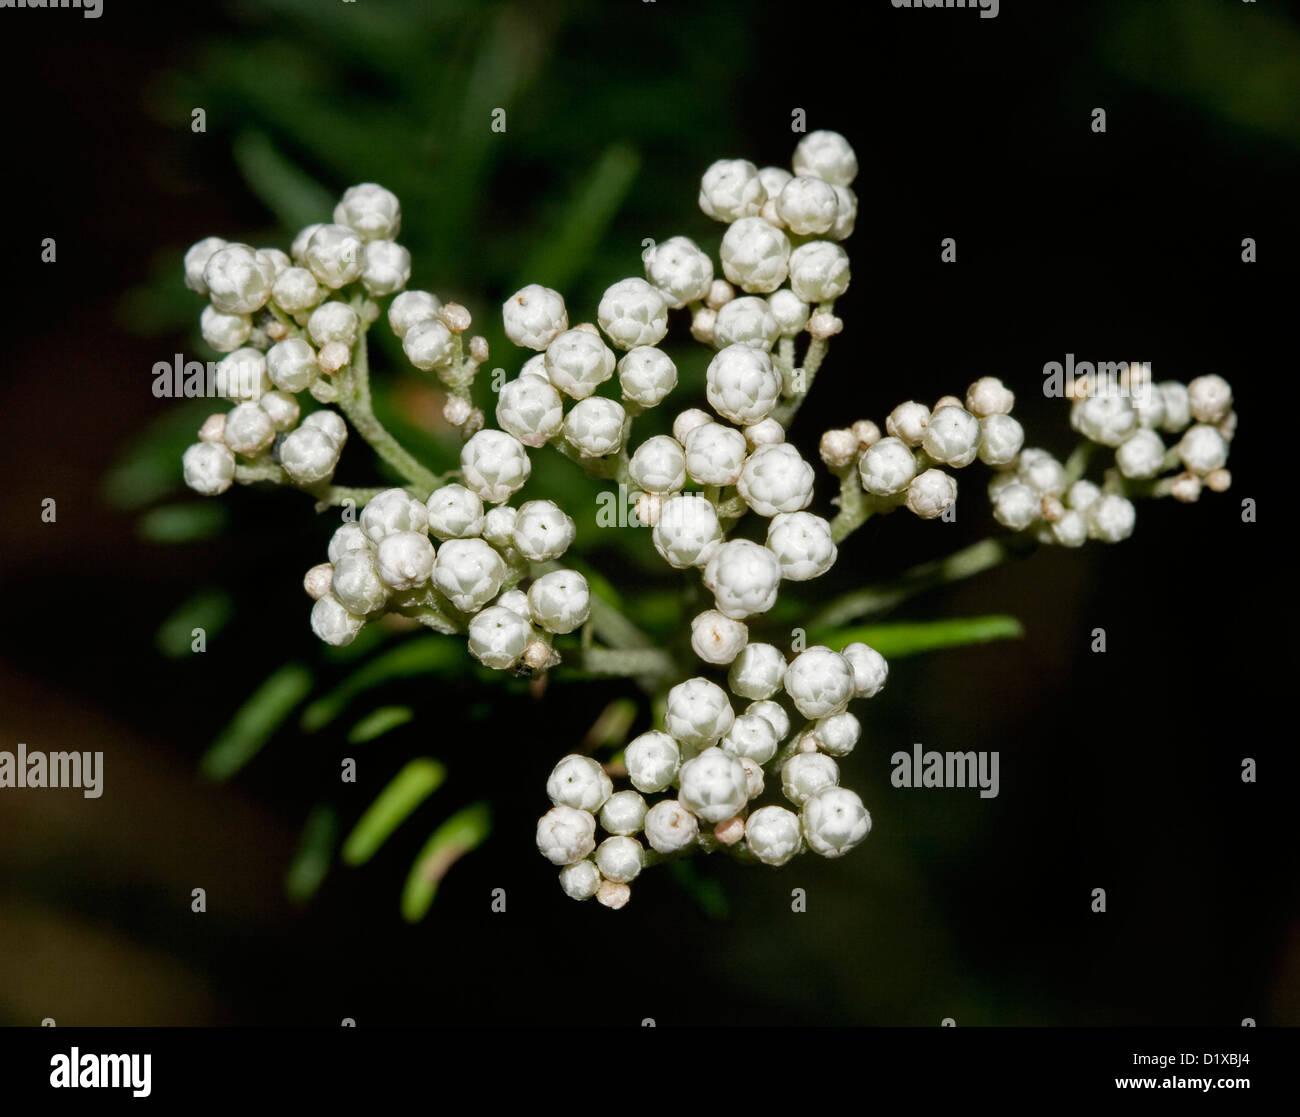 Australian flowers white background stock photos australian cluster of white flowers of ozothamnus diosmifolius riceflowers and foliage of australian native plant mightylinksfo